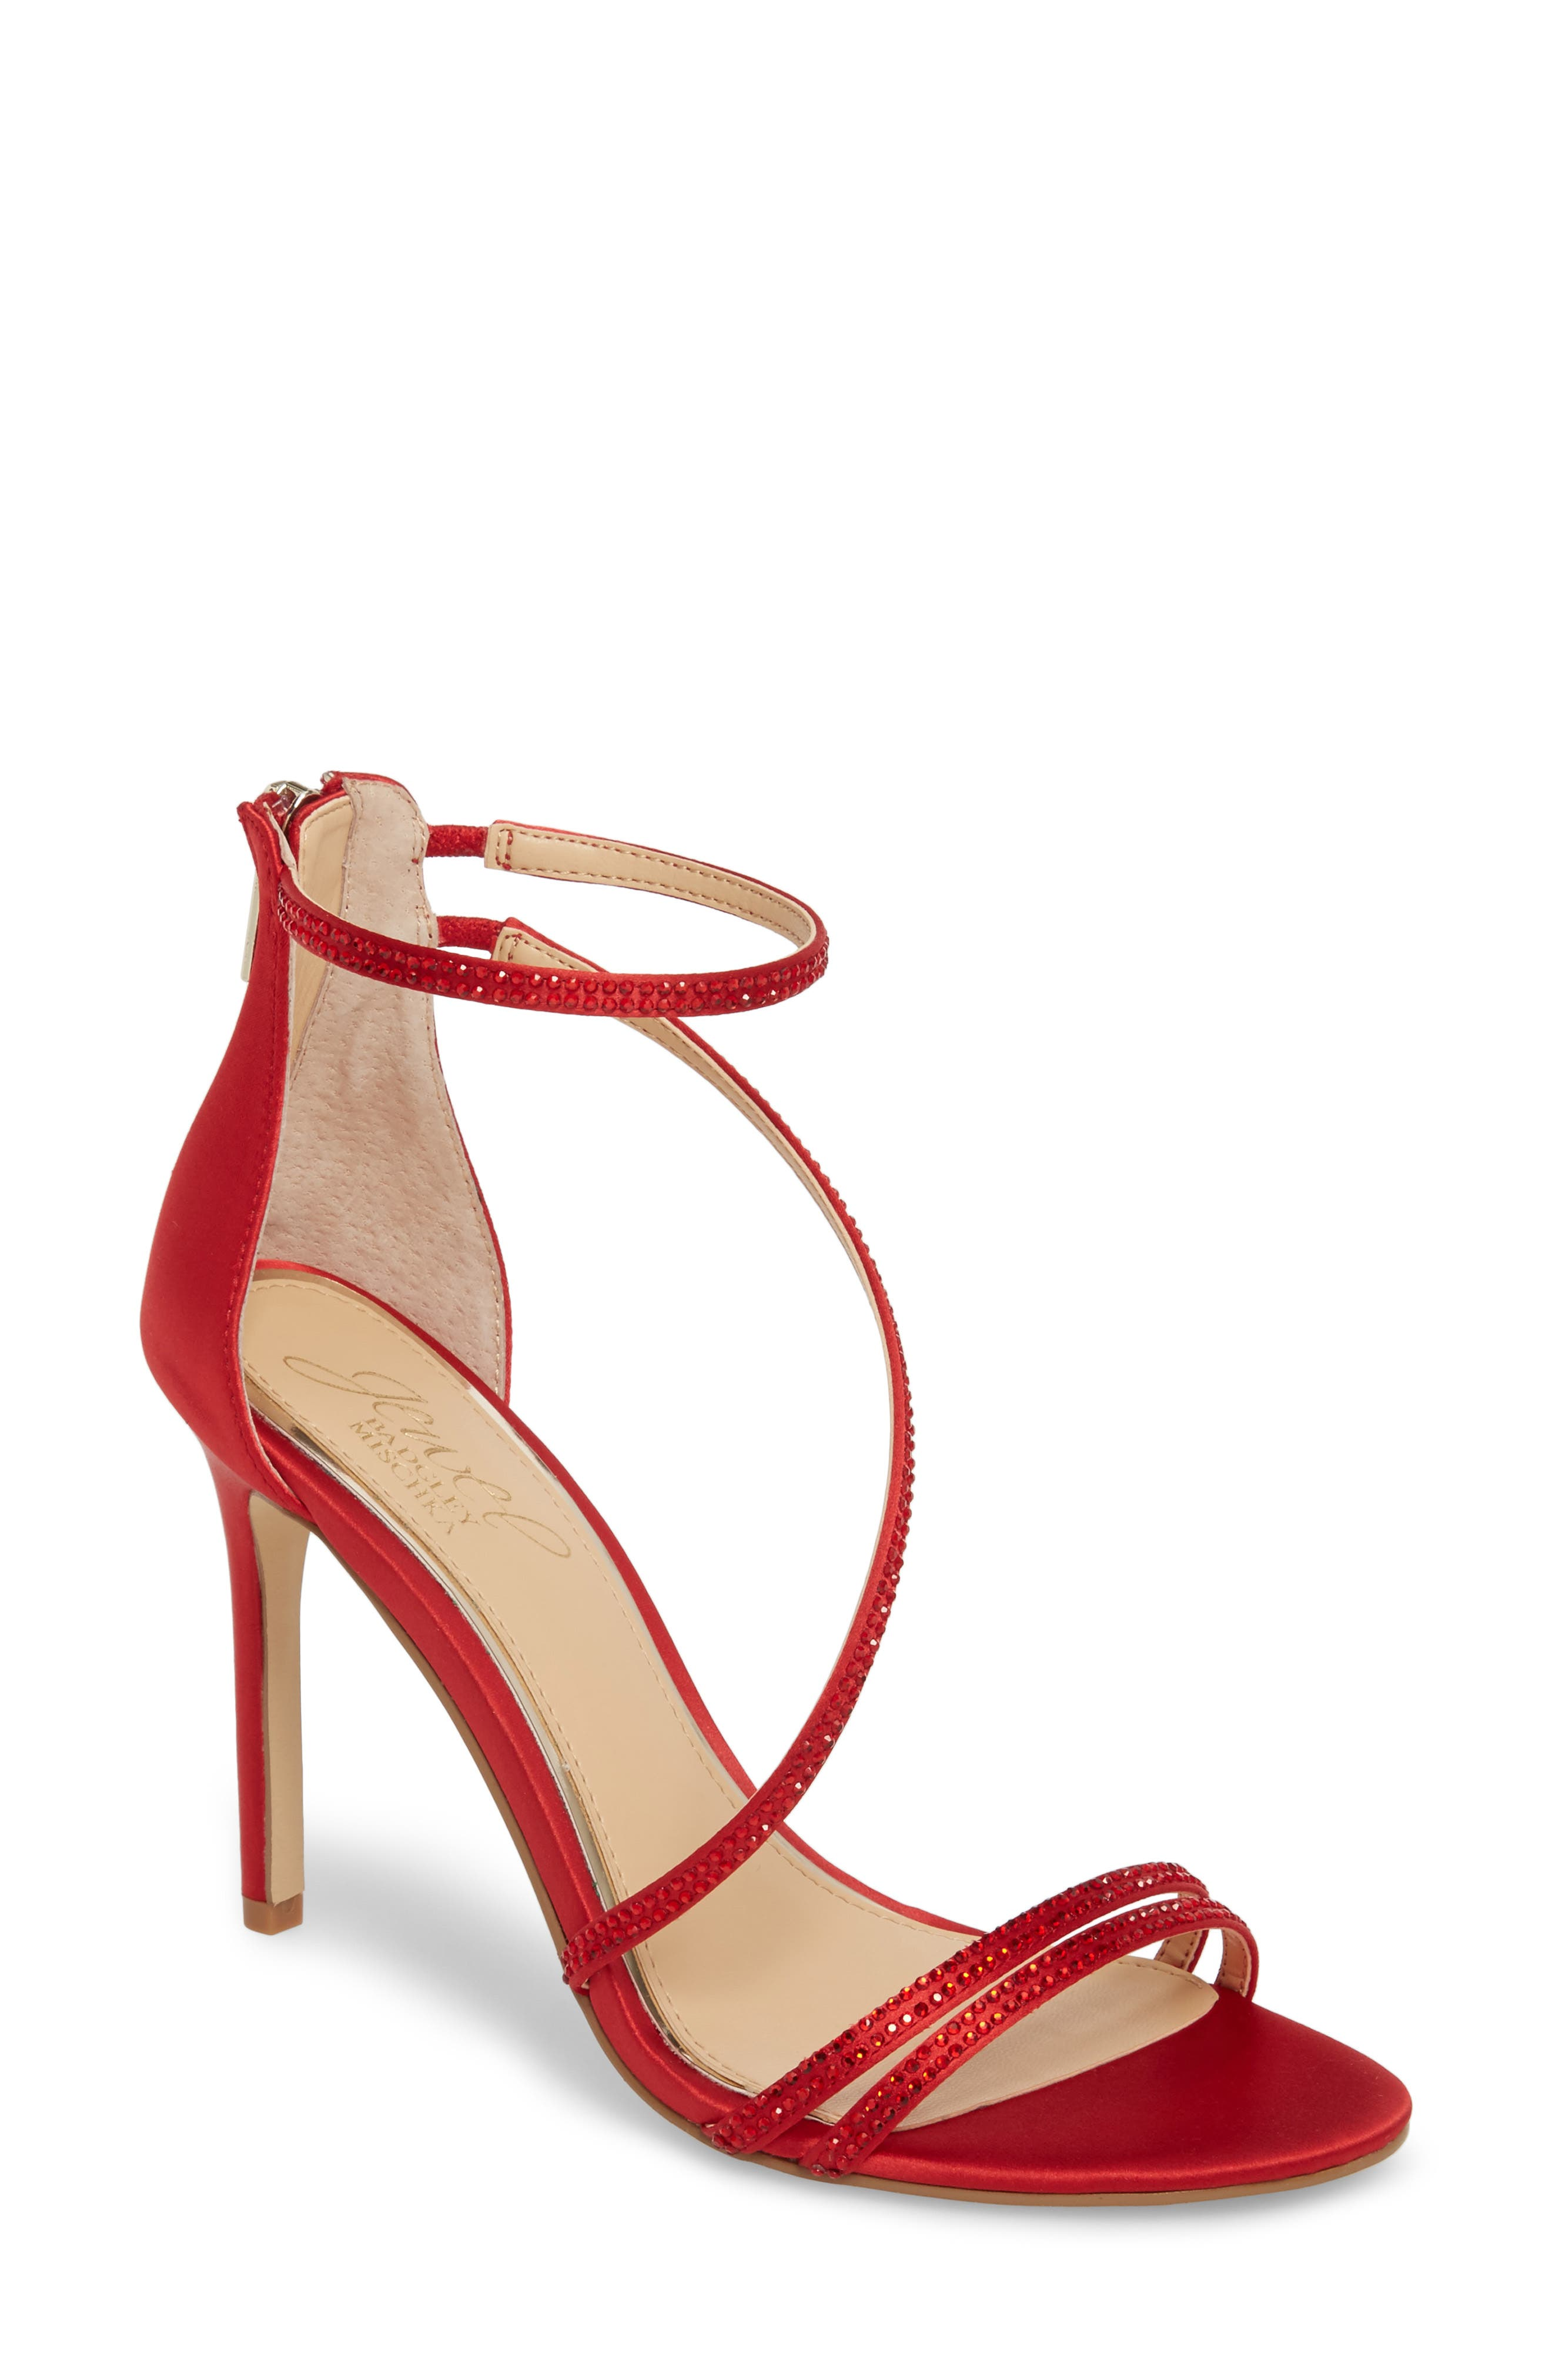 Gail Crystal Embellished Sandal,                             Main thumbnail 1, color,                             Red Satin